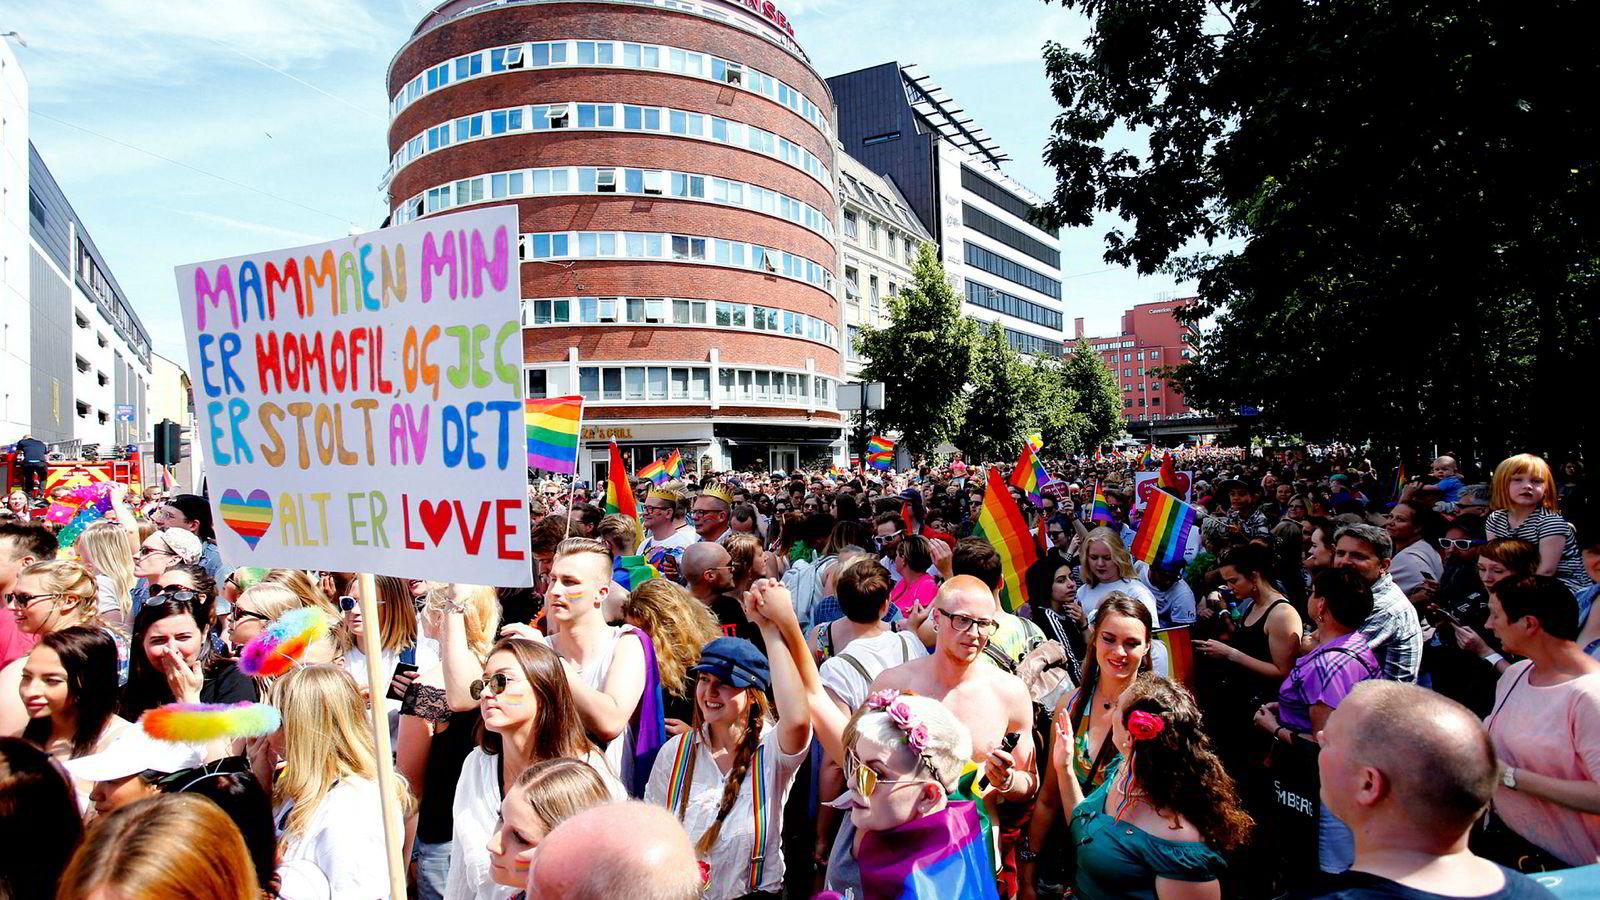 40.000 mennesker møtte opp i fjorårets Pride-parade i Oslo. Årets versjon finner sted på lørdag. Foto: Audun Braastad/NTB scanpix